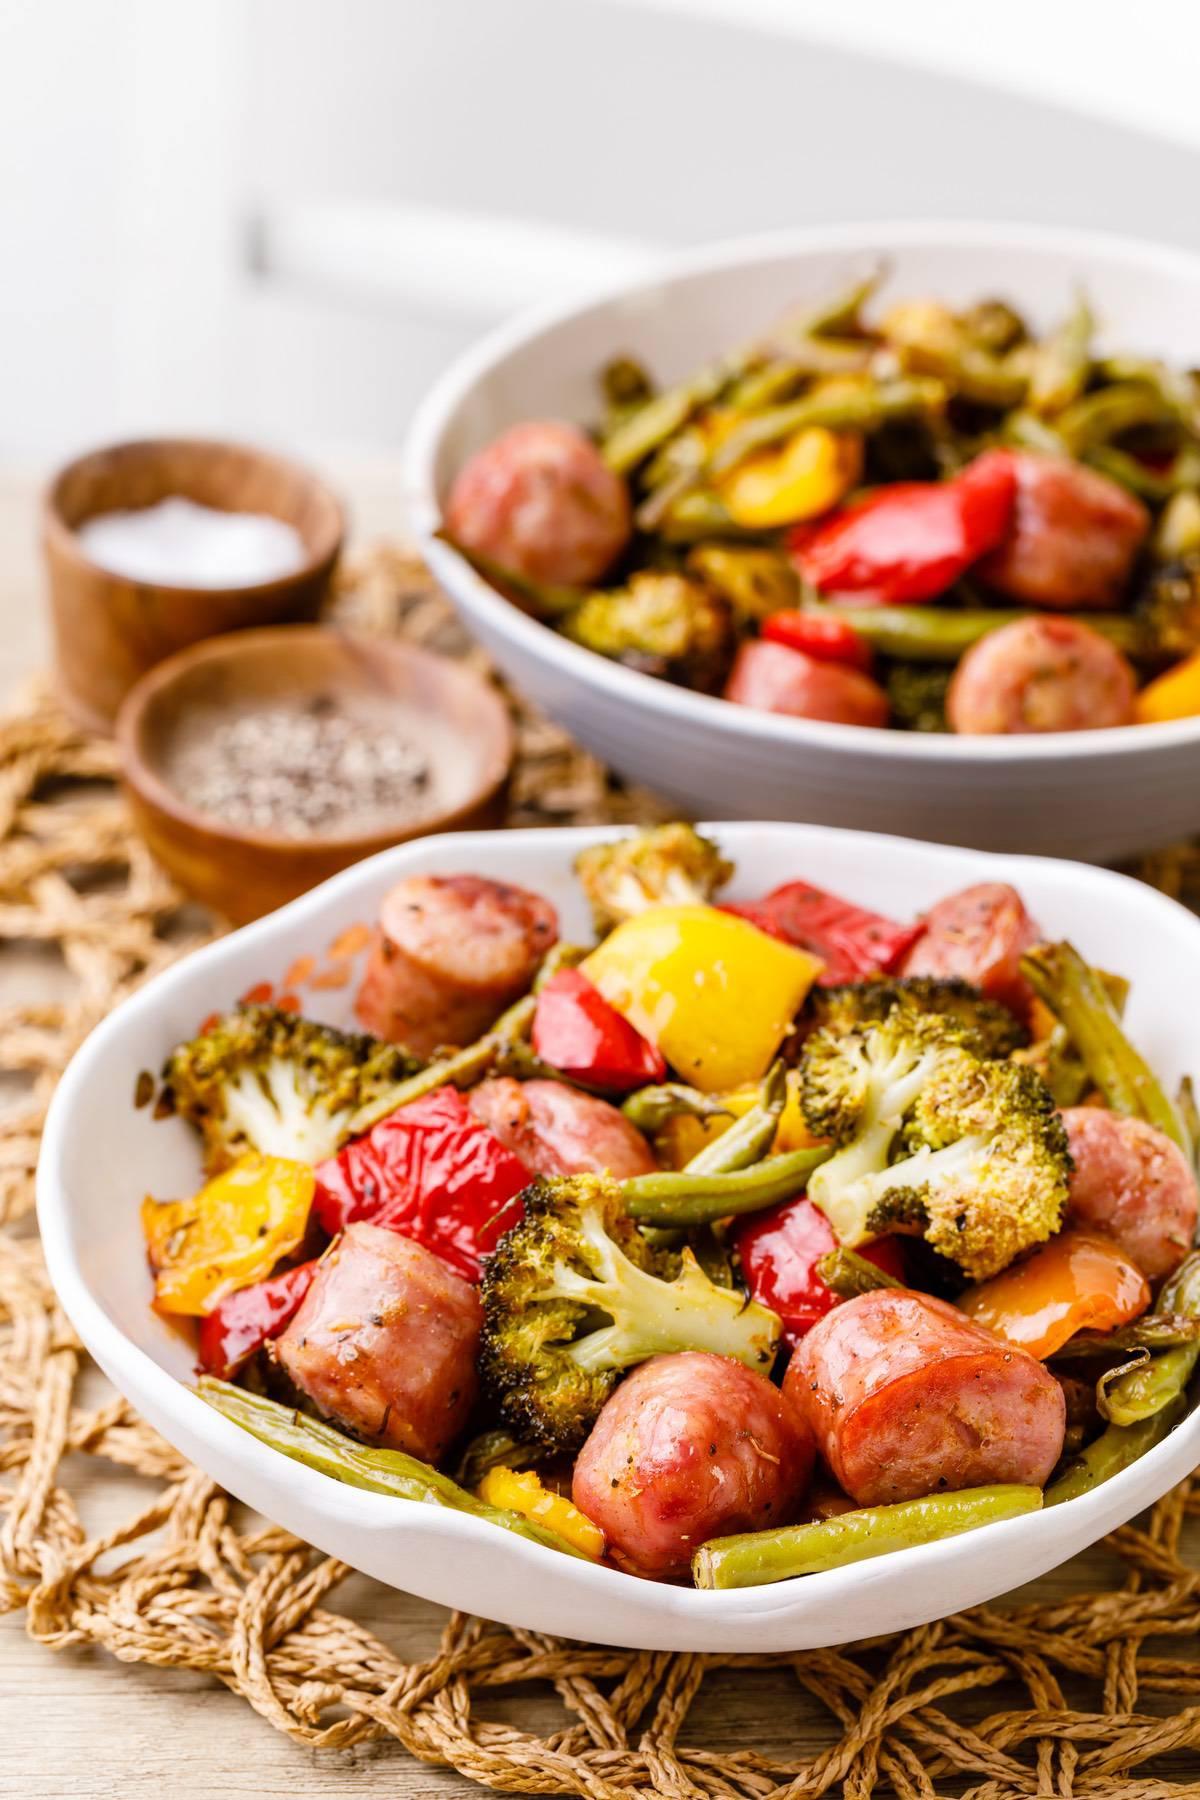 Baked Sheet Pan Sausage And Vegetables Recipe